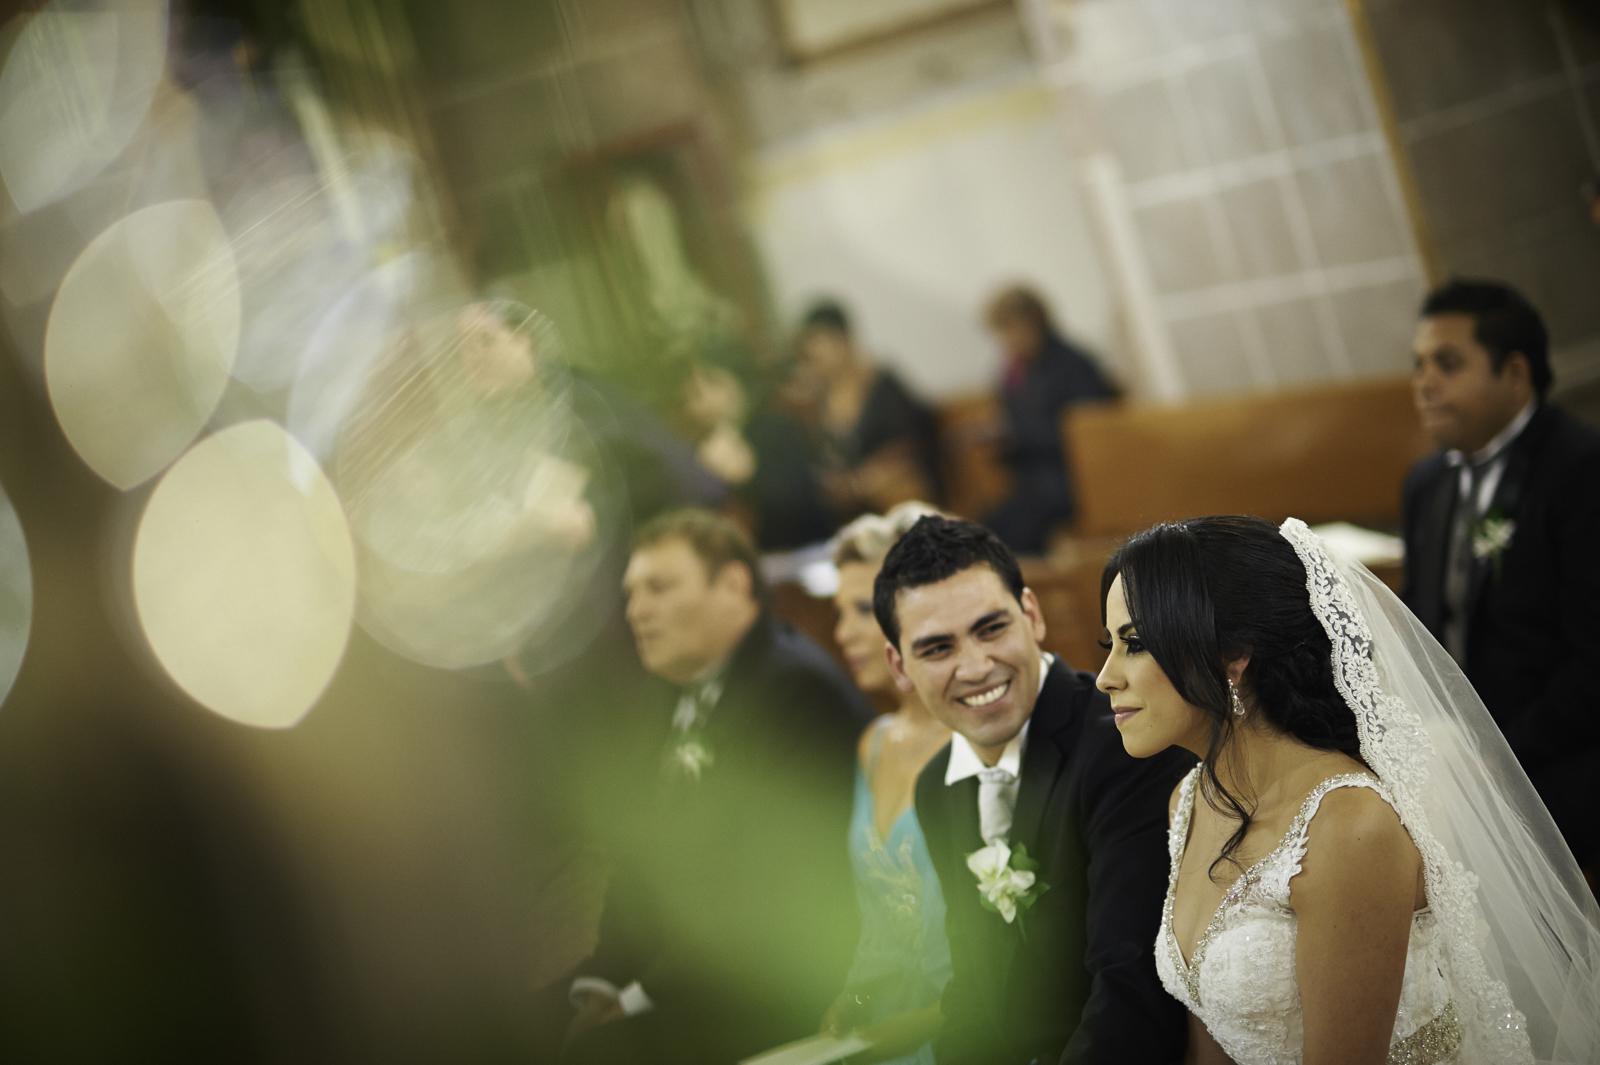 Wedding Photographer Puerto Vallarta - Ceremony photography